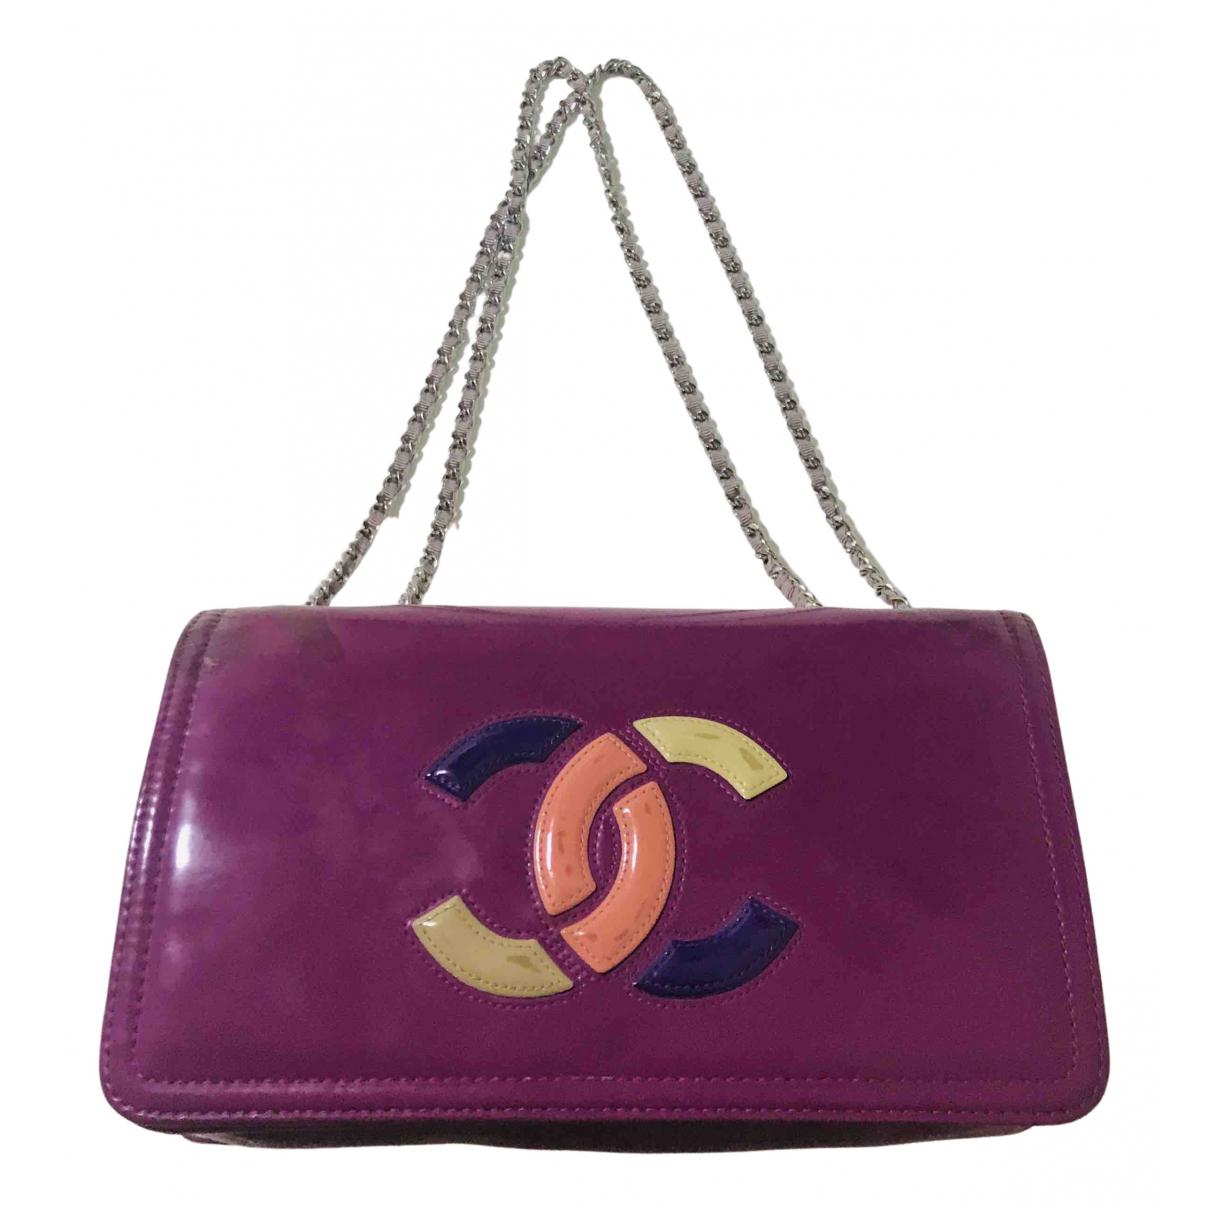 Chanel N Purple Patent leather handbag for Women N